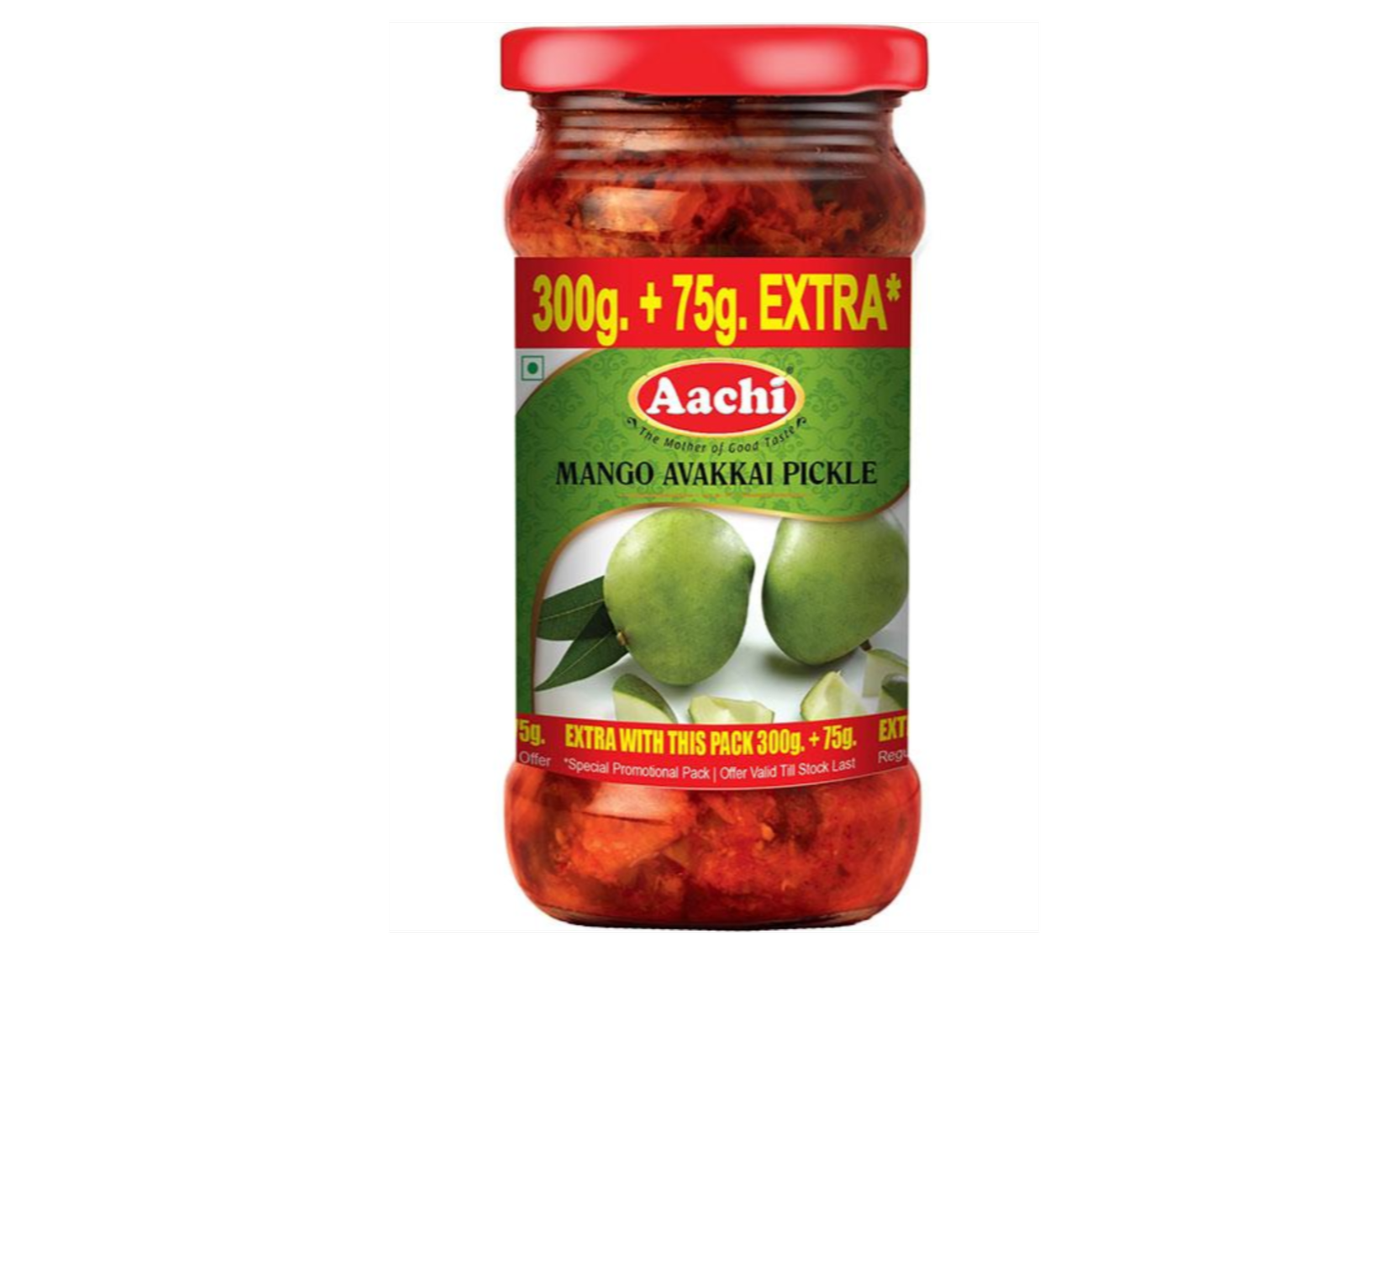 Aachi Mango Avakkai Pickle